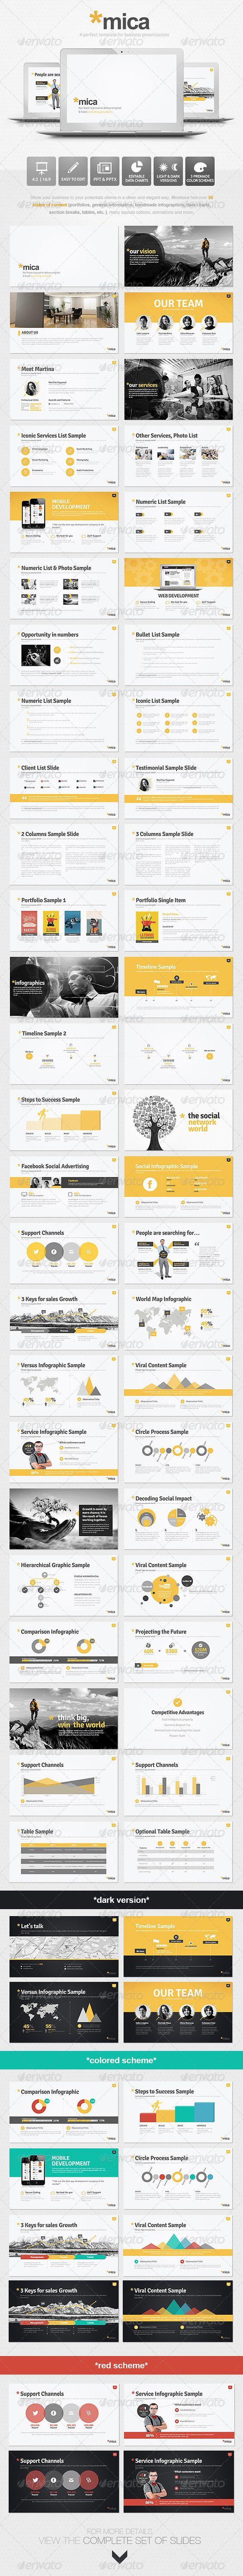 Presentation Templates - Mica Powerpoint Presentation Template | GraphicRiver